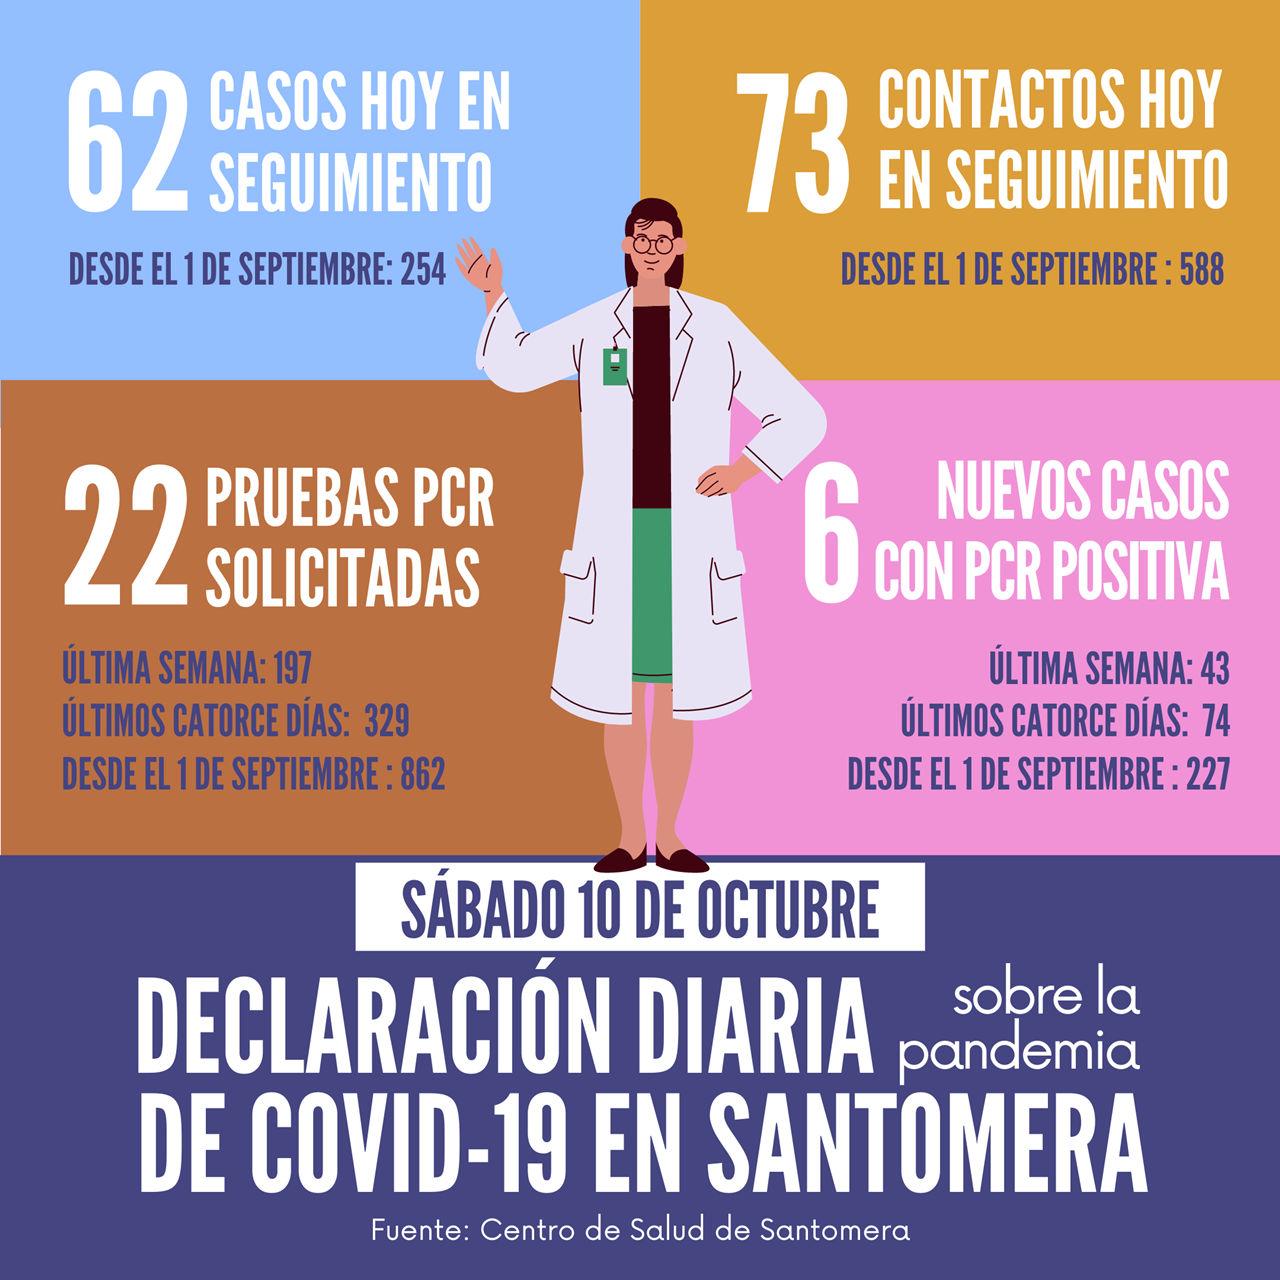 20201010_Datos COVID-19 Santomera